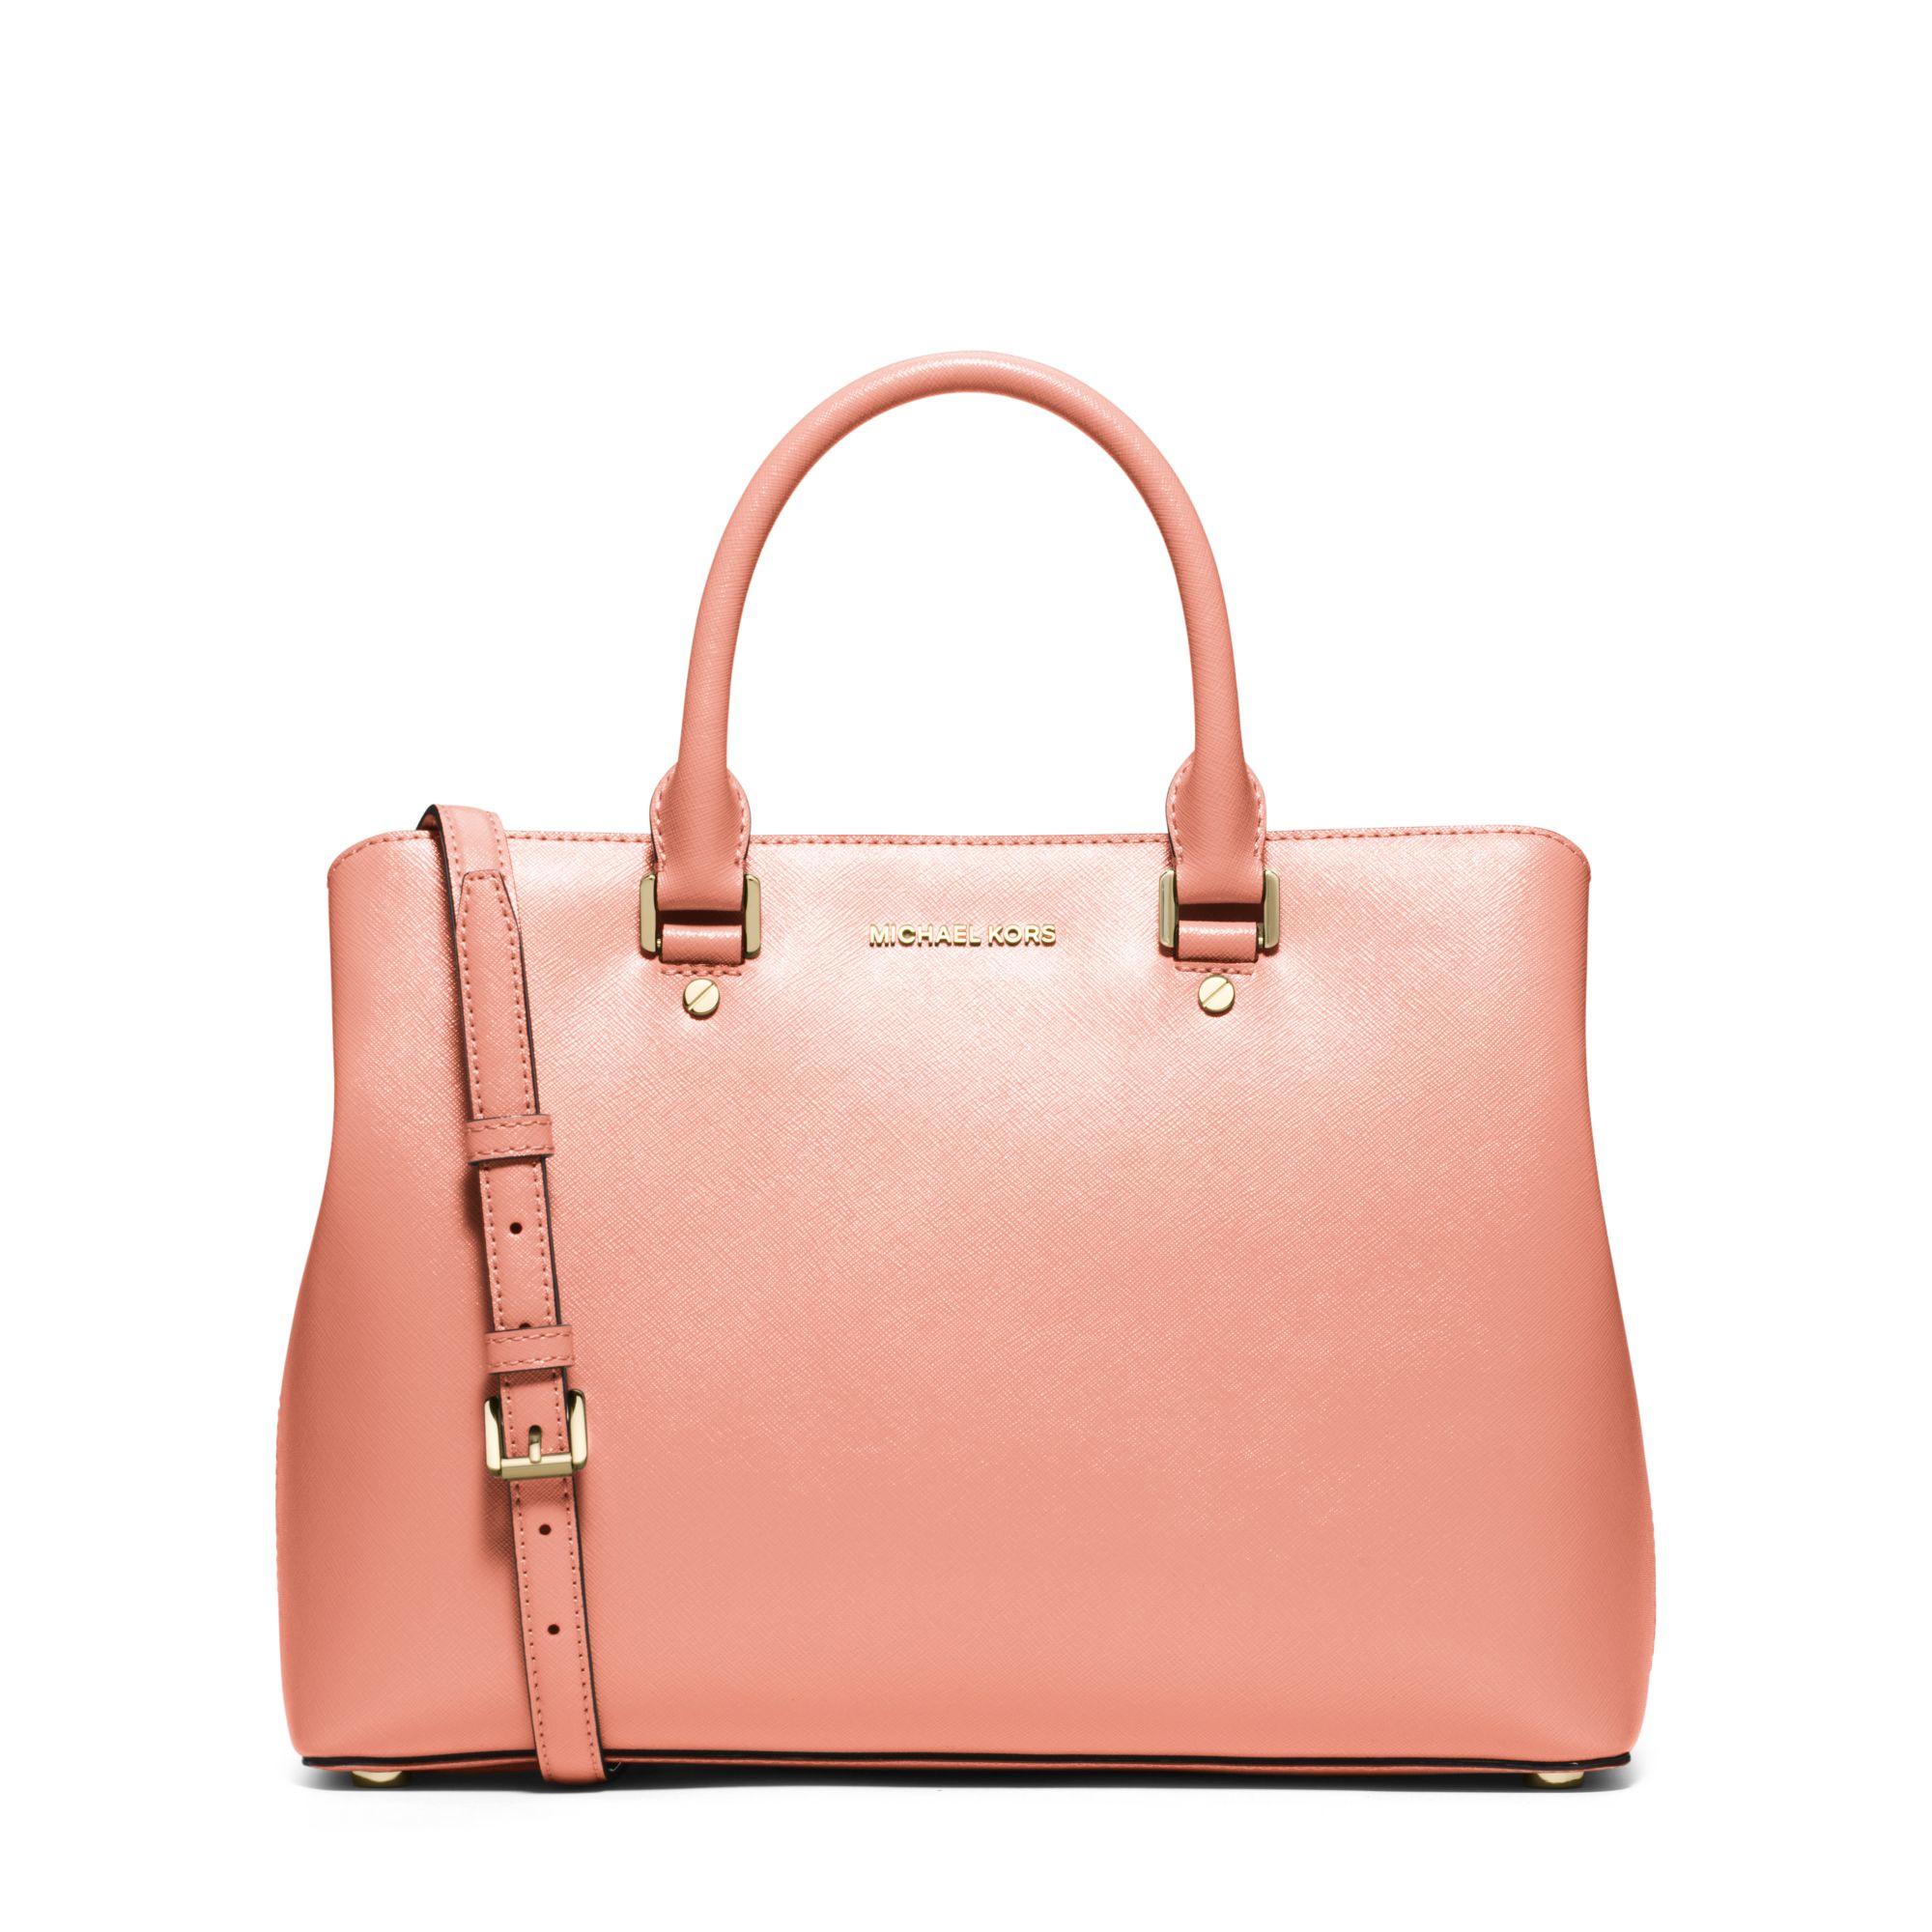 e6b764d4f712 ... low cost lyst michael kors savannah large patent saffiano leather  satchel bd090 cf8c4